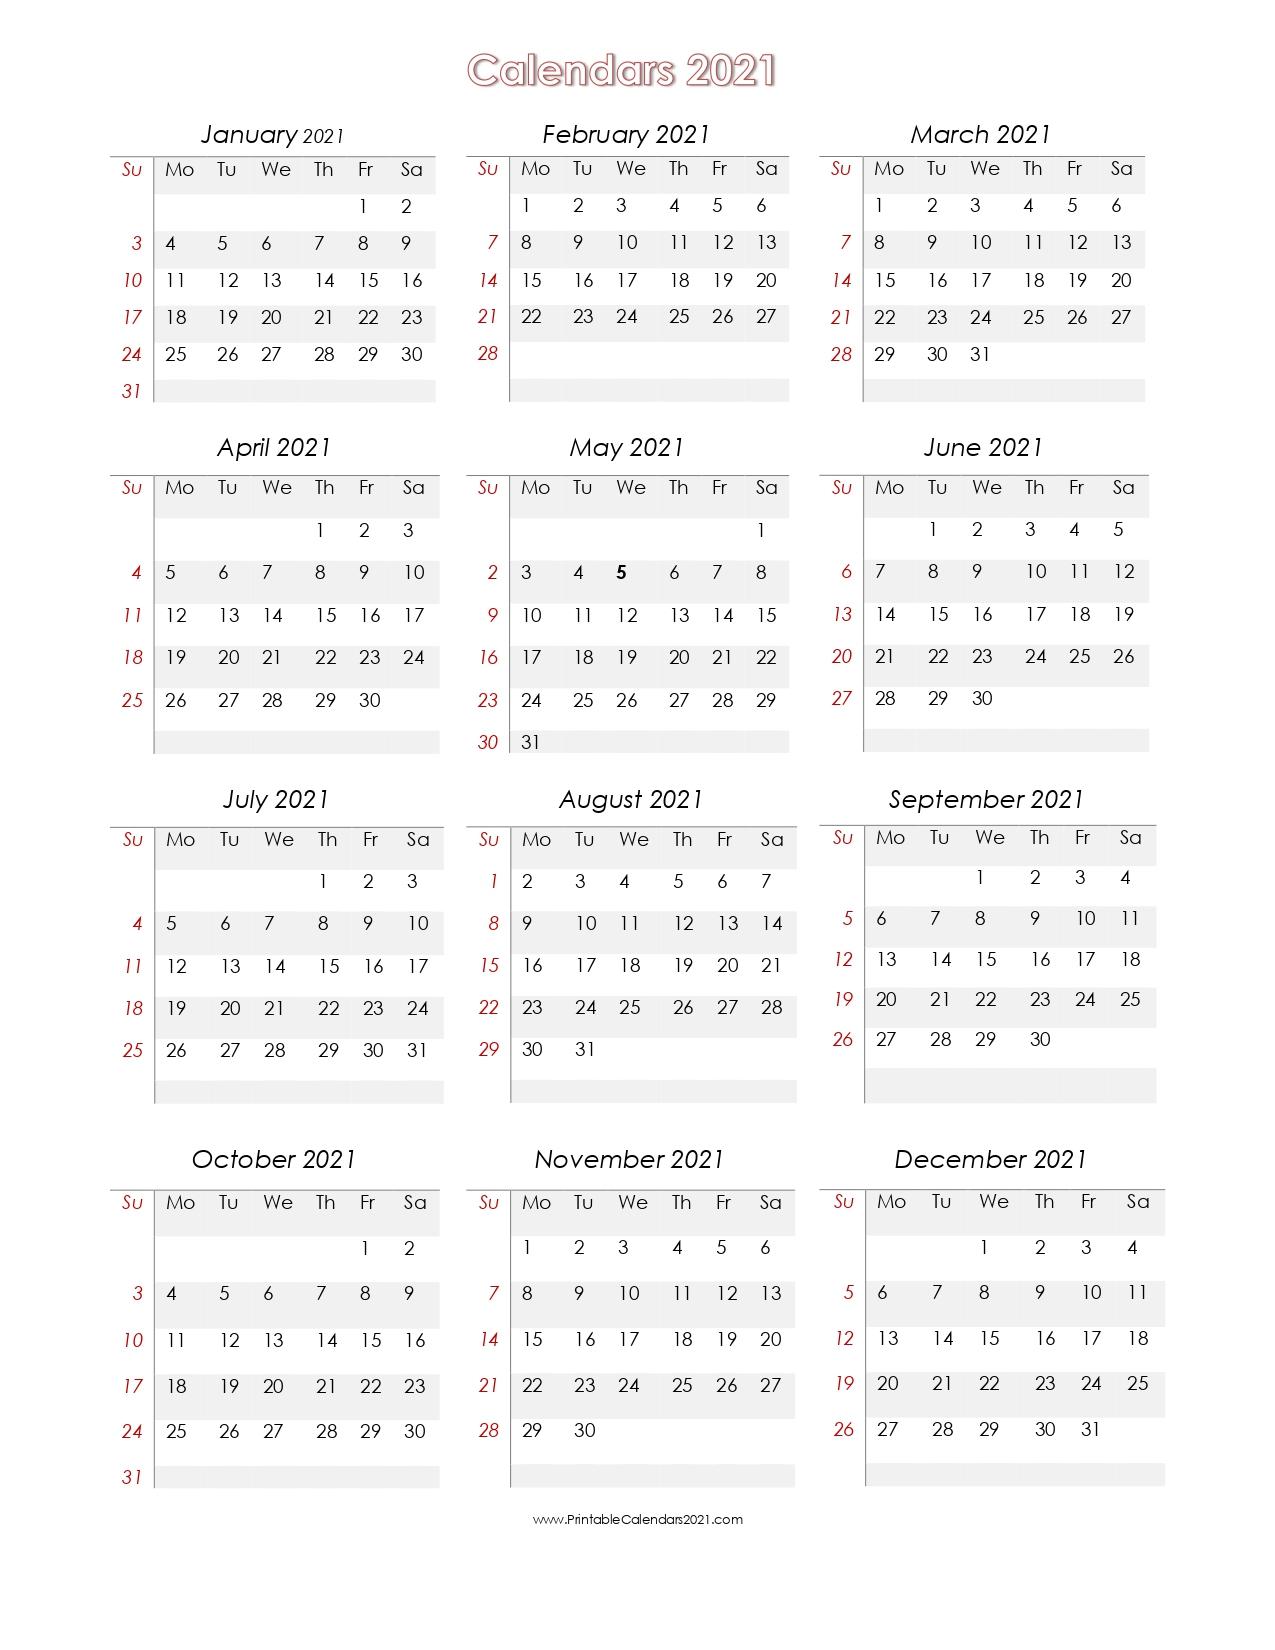 56+ Printable Calendar 2021 One Page, Us 2021 Calendar in Calendar 2021 November Fill In